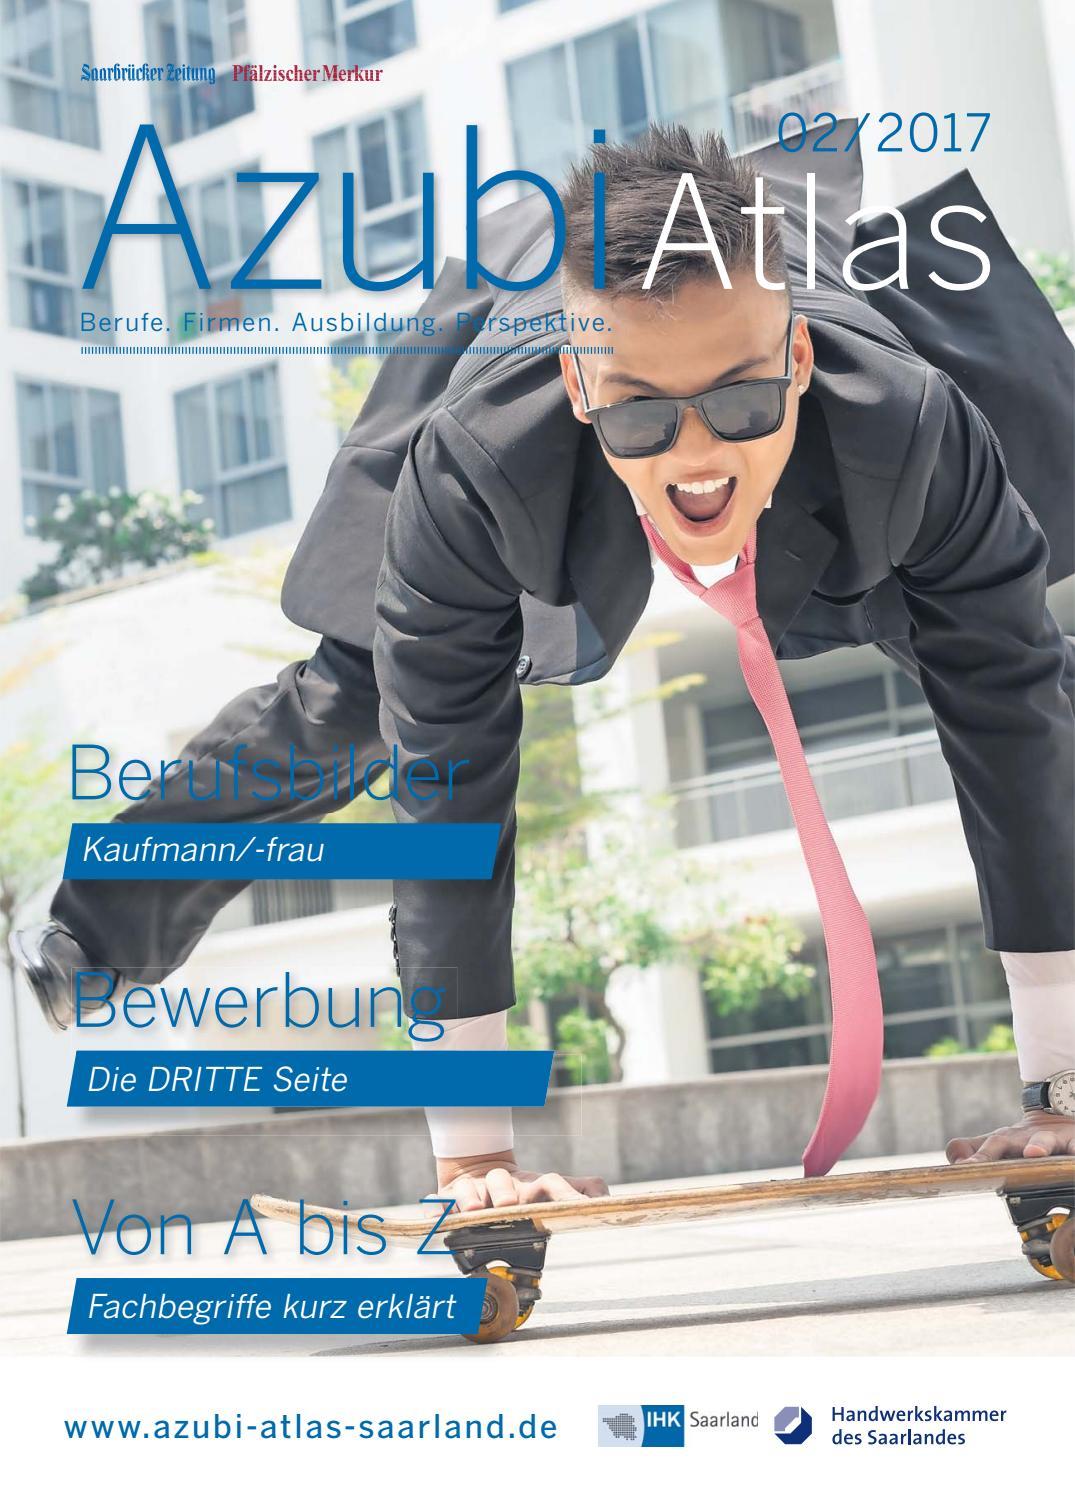 Azubi Atlas 022017 By Saarbrücker Verlagsservice Gmbh Issuu